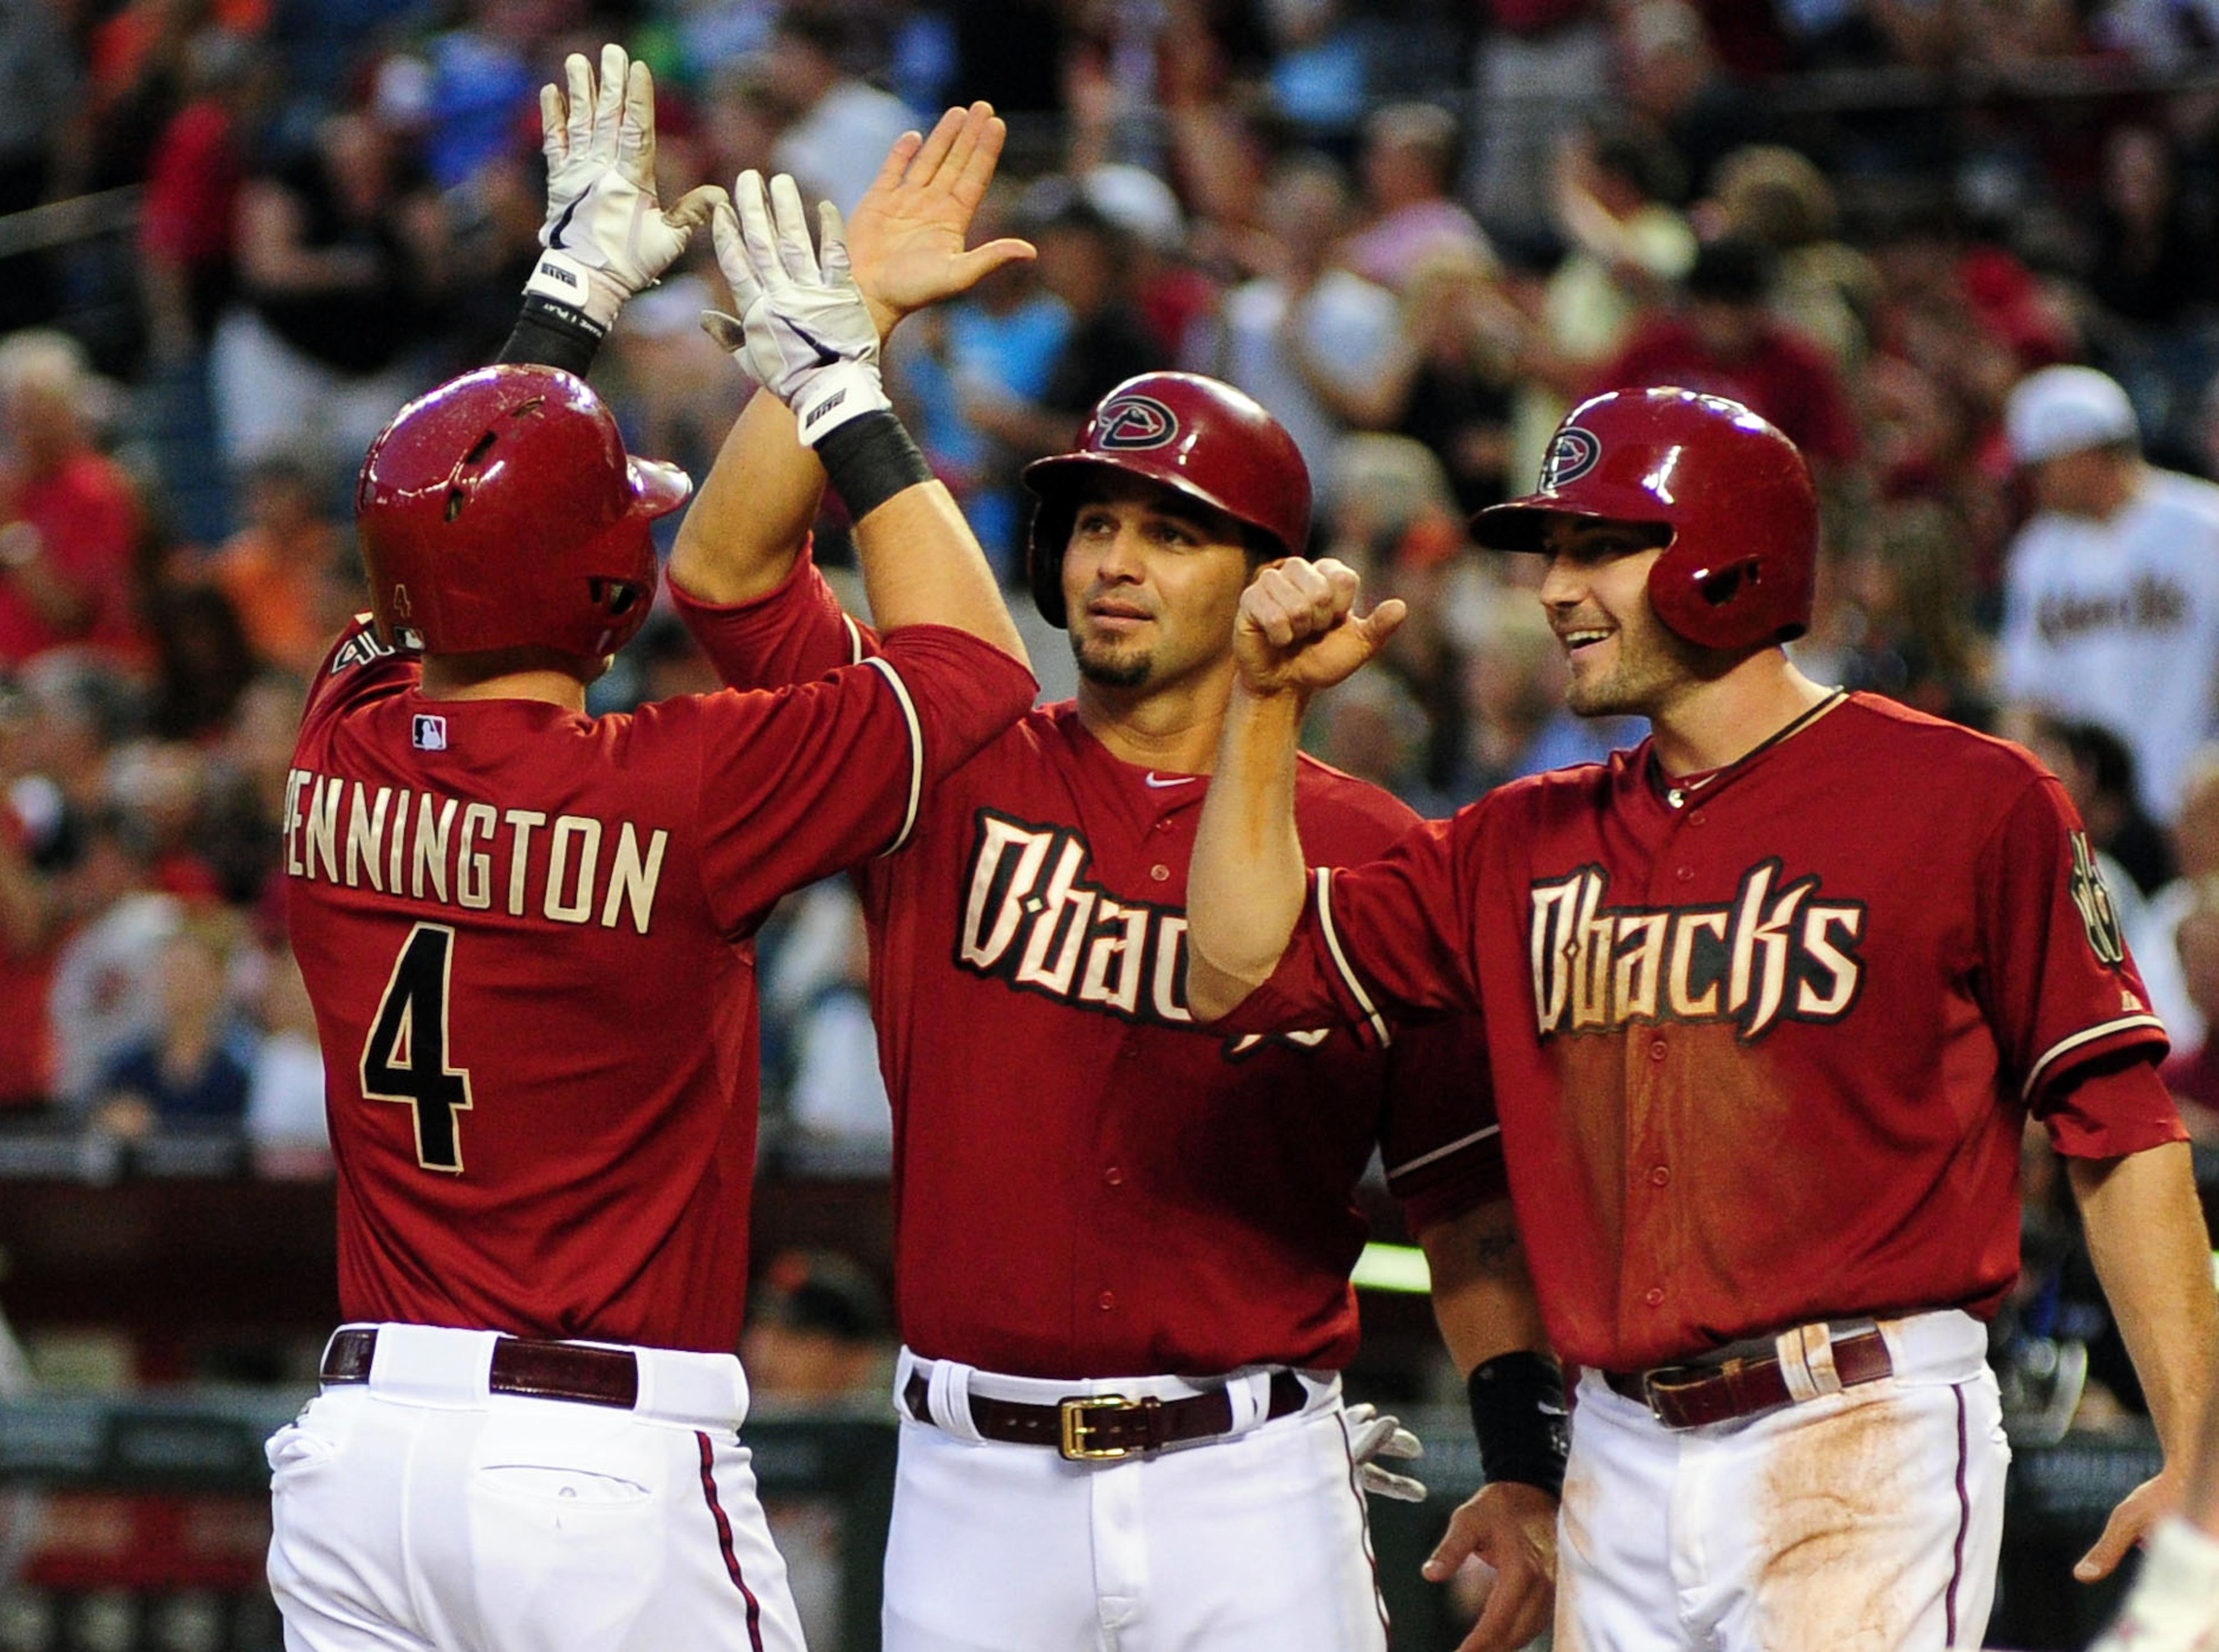 Pennington's home run was a bright spot in a dismal series.